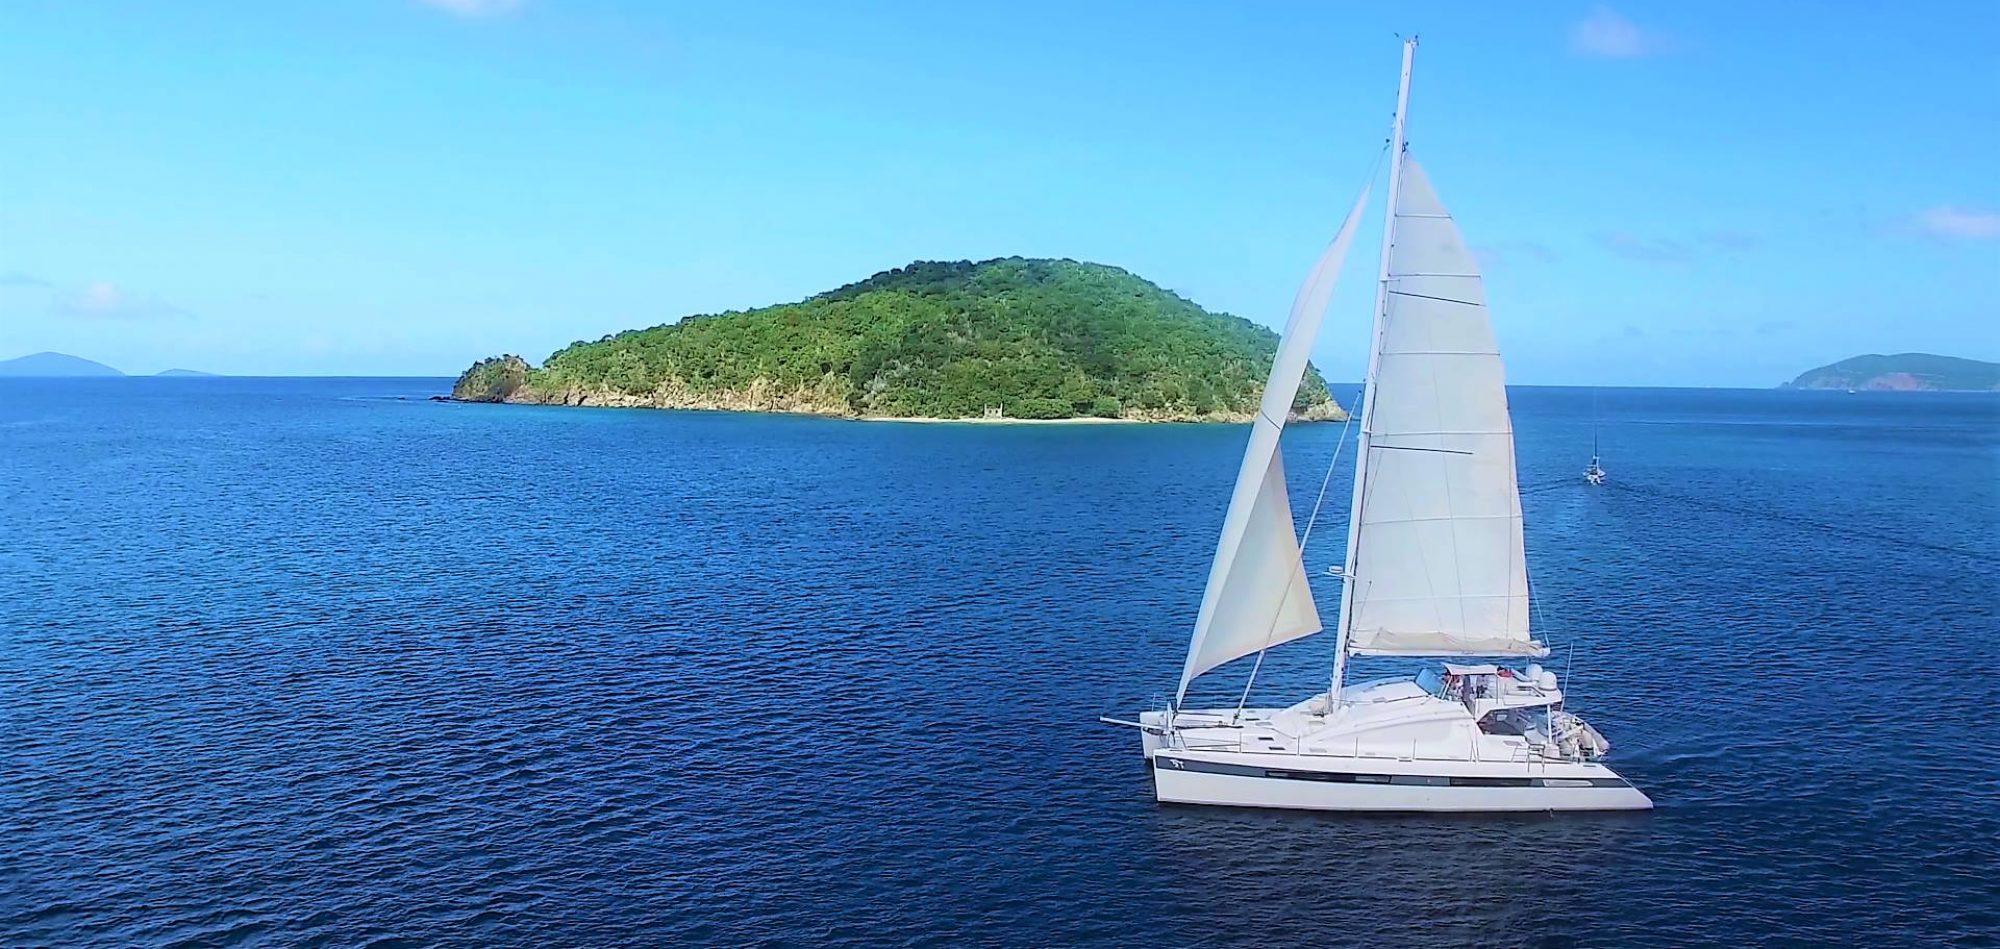 LUAR - under sail